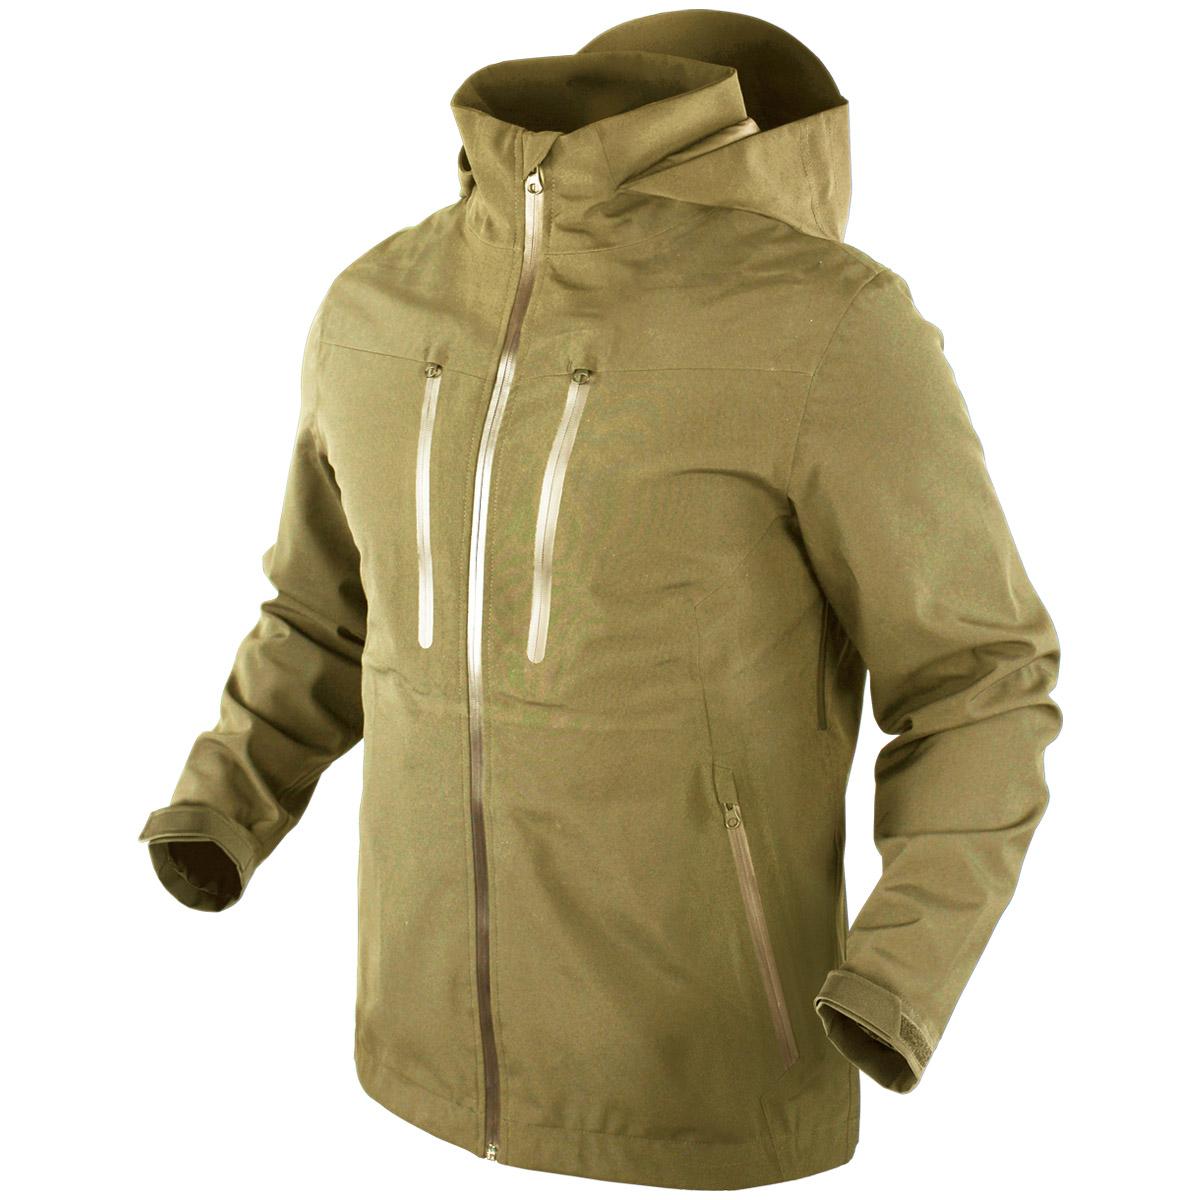 condor aegis hardshell hooded jacket mens waterproof